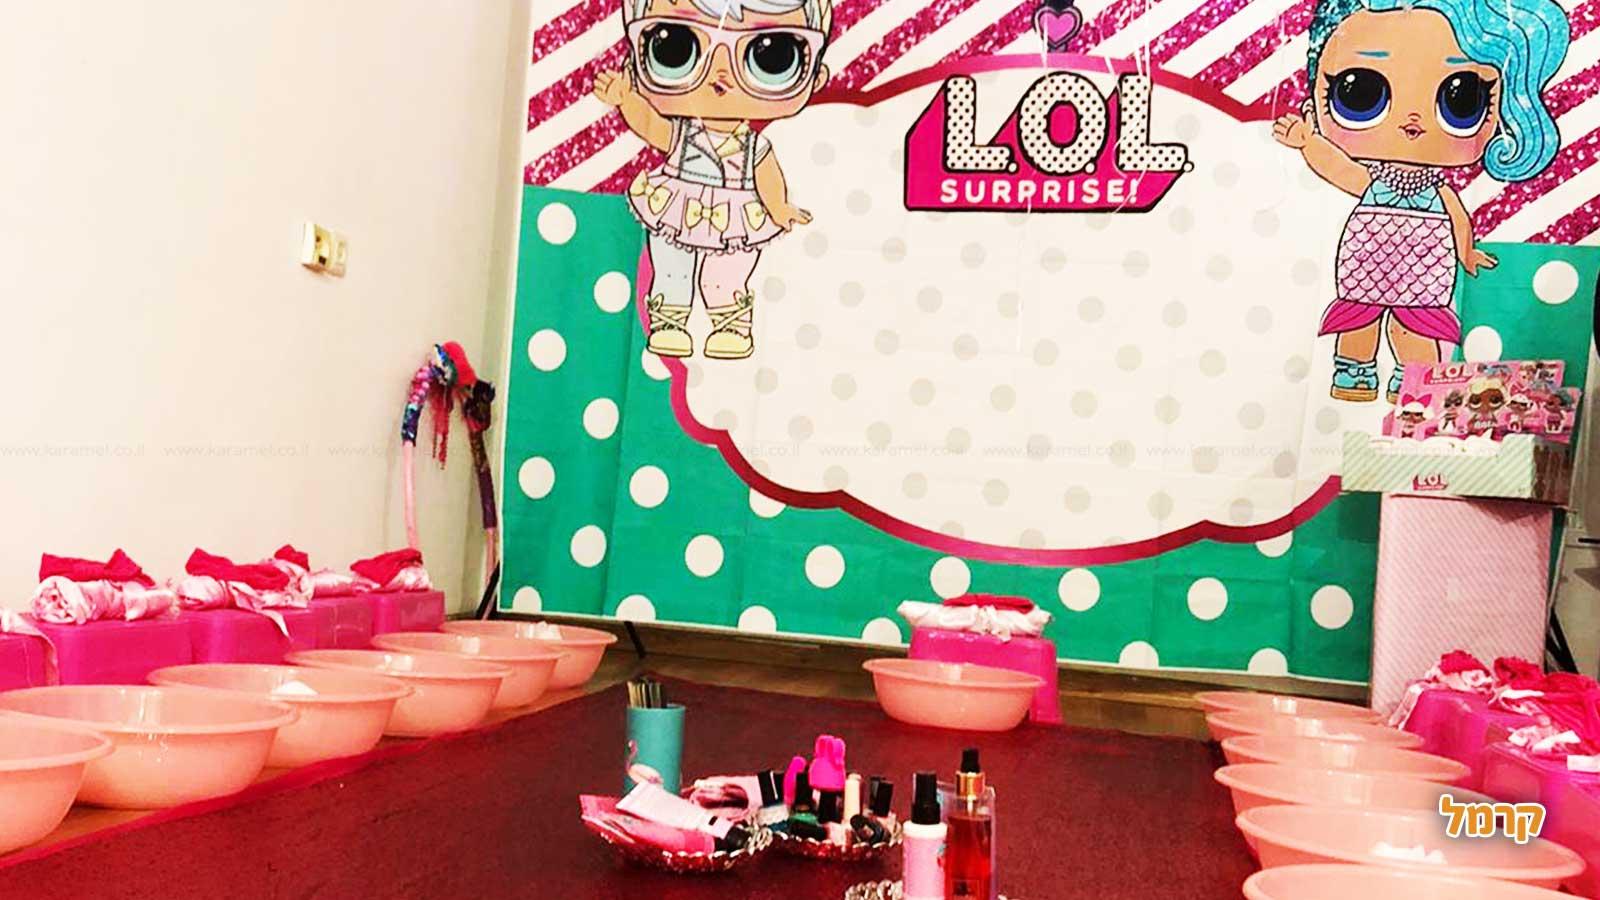 Candy Spa - קנדי ספא מפנק - 073-7840224